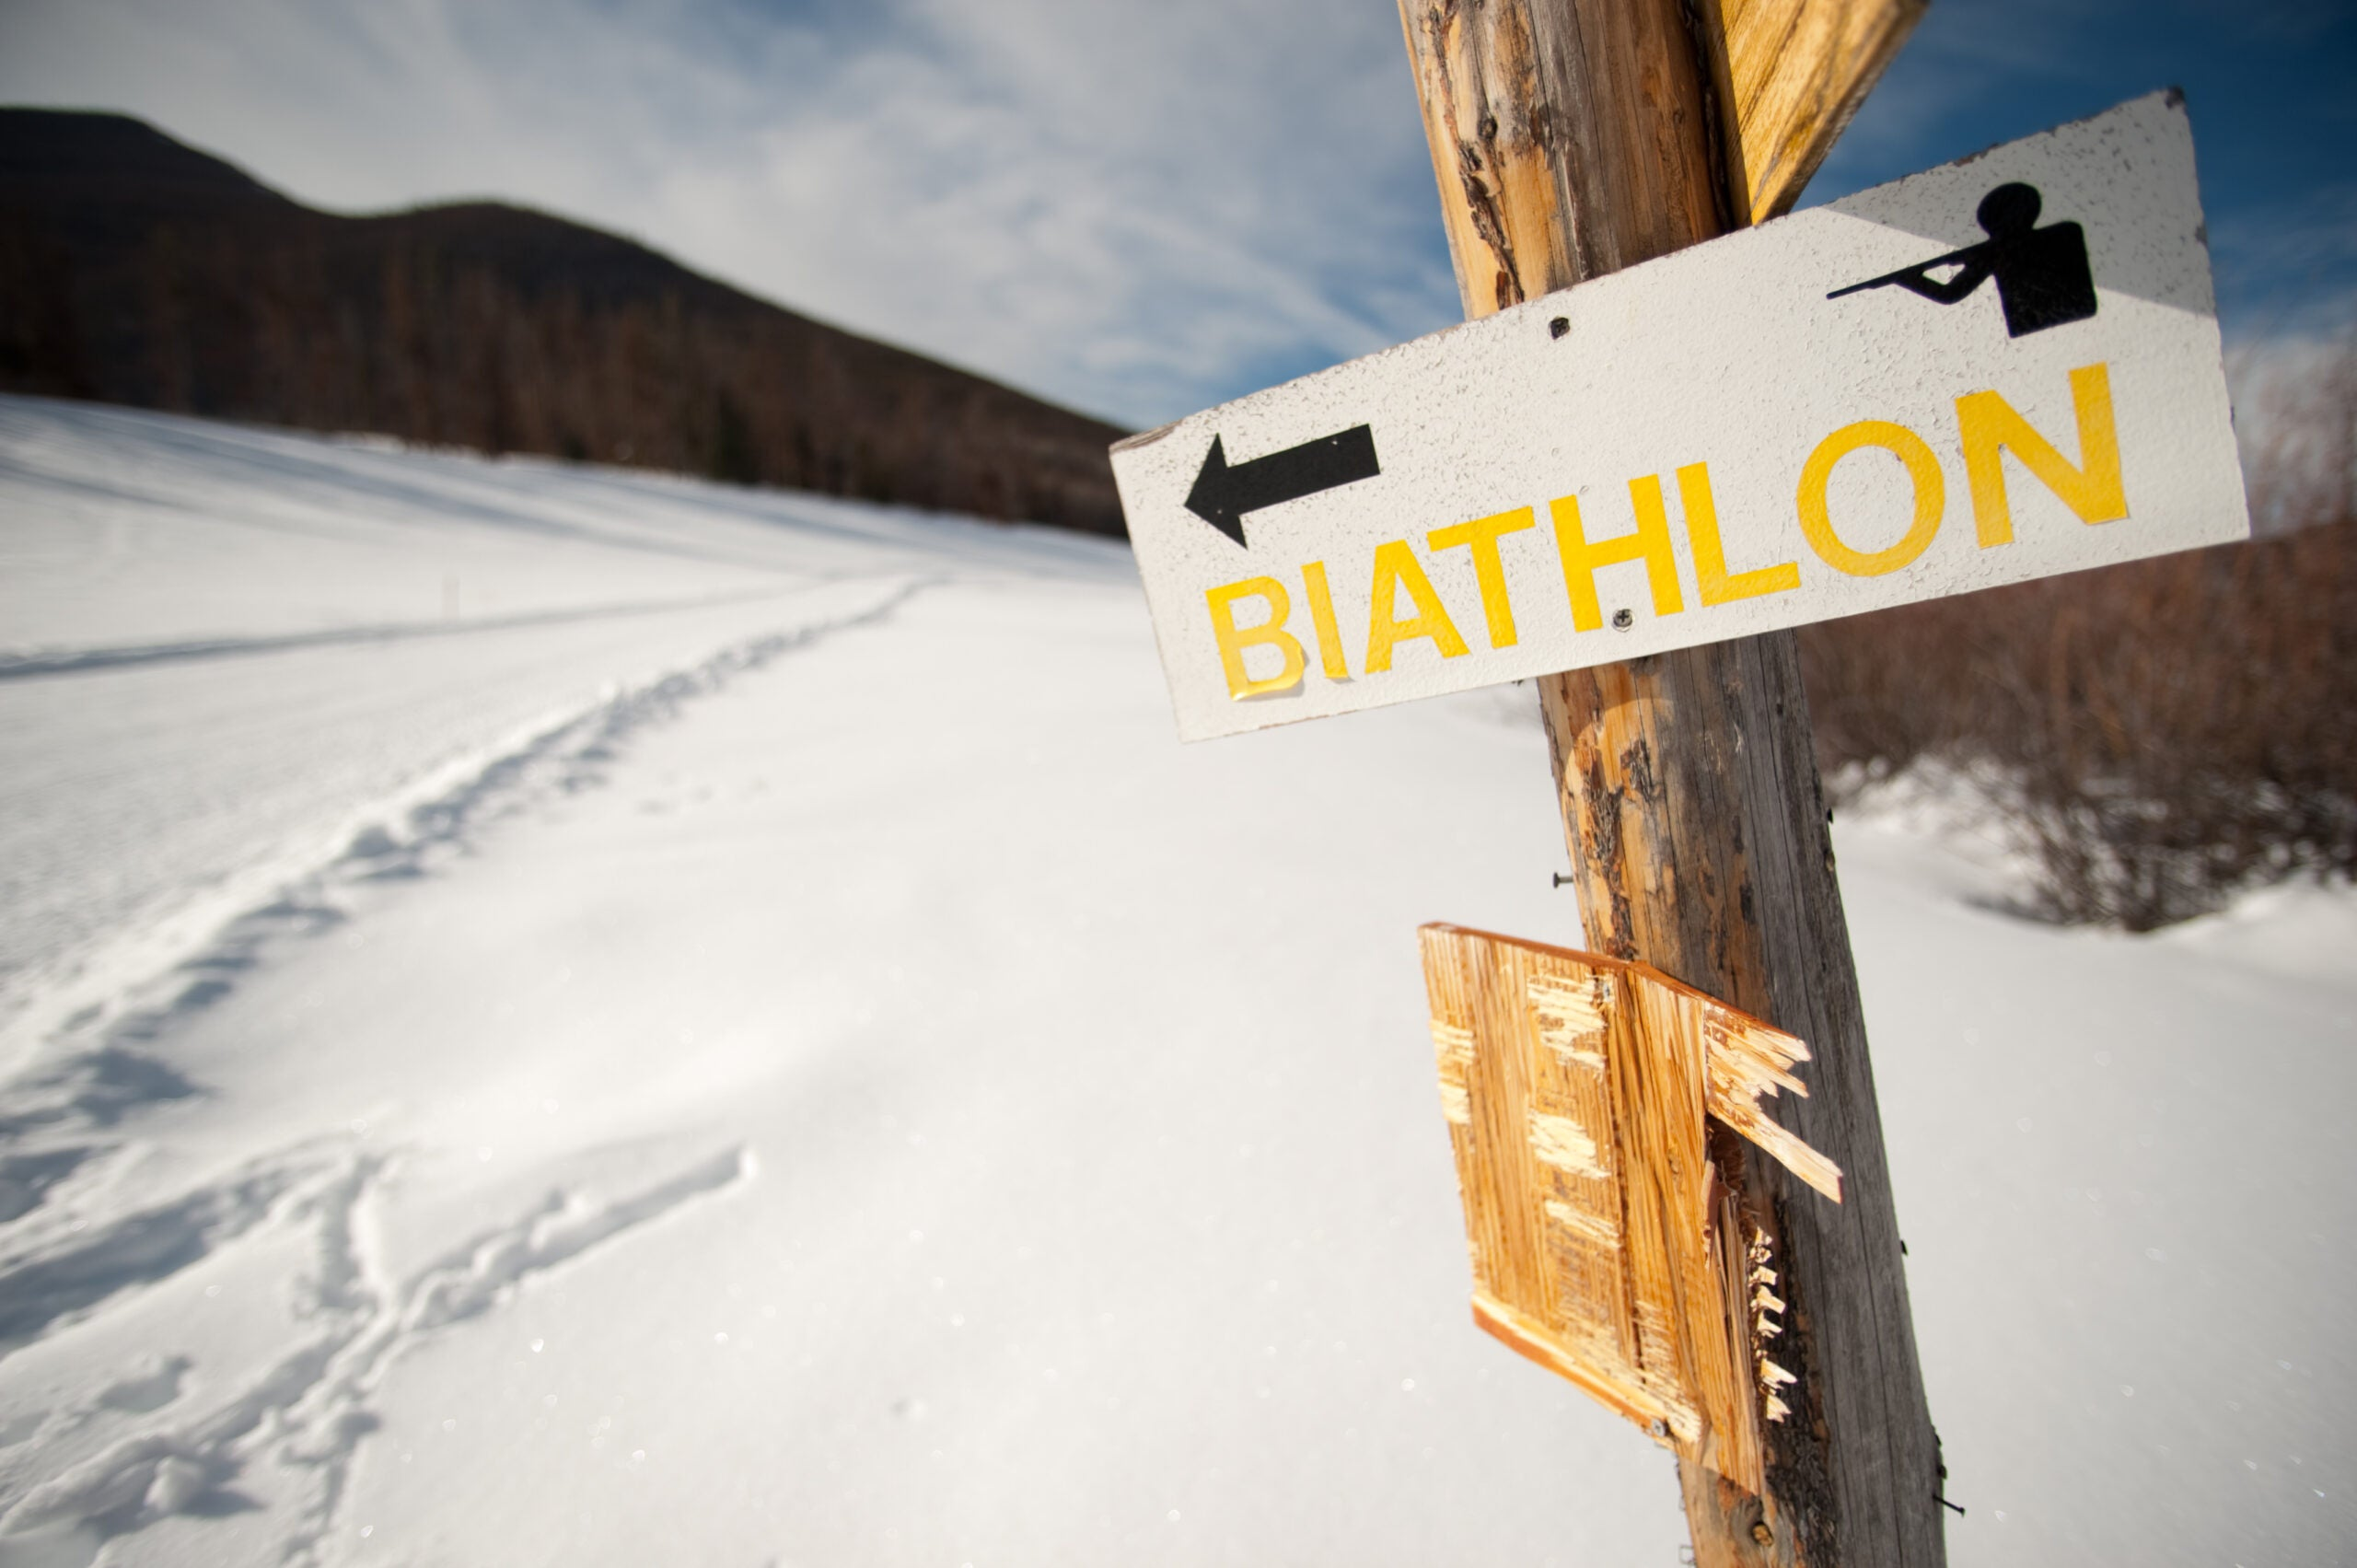 Behind The Scenes at the Colorado State Campionship Biathlon Finals